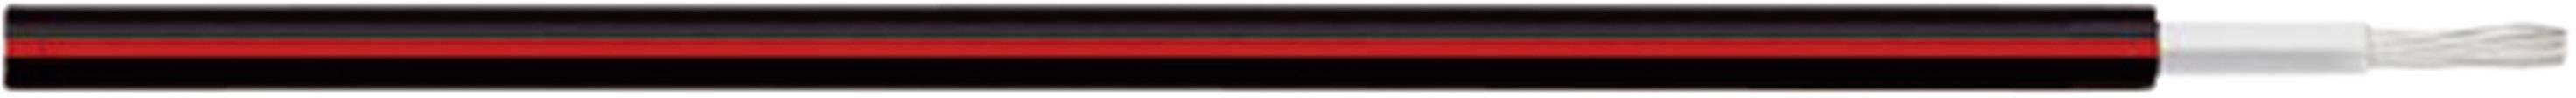 Fotovoltaický kabel ÖLFLEX® SOLAR XLR-R 1 x 2.50 mm² černá, červená LAPP 0023390 1000 m